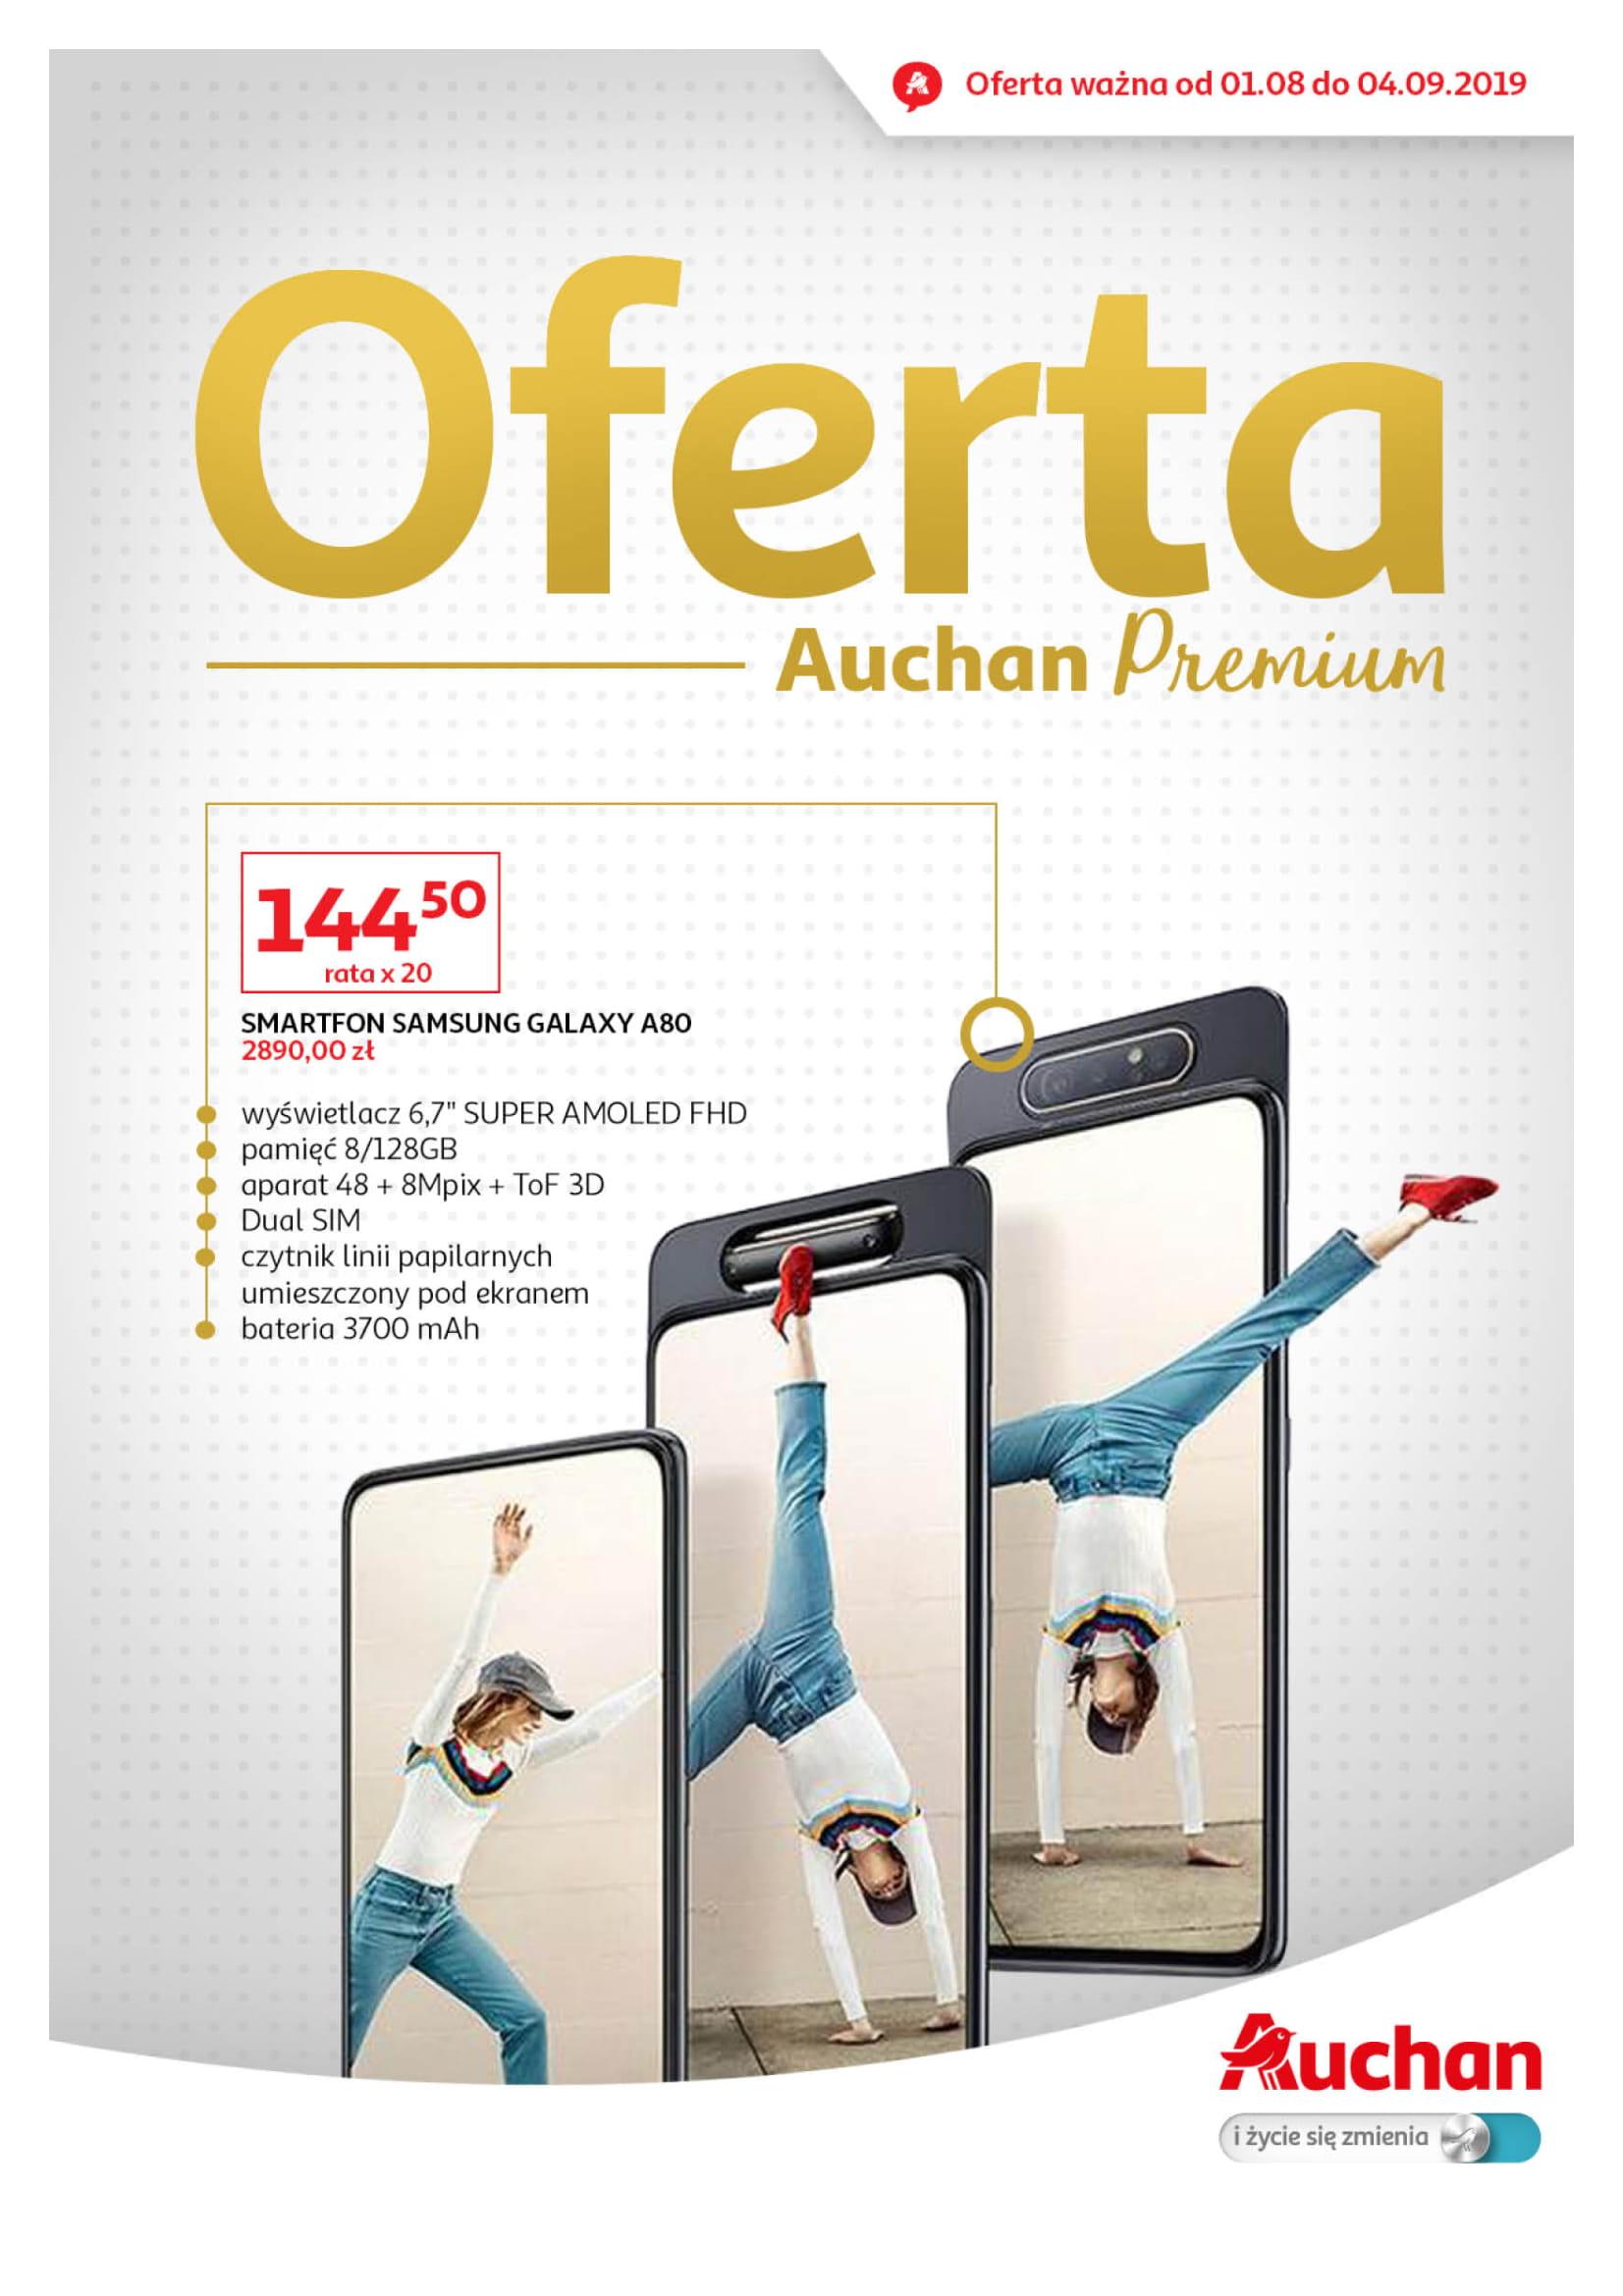 Auchan: Gazetka Premium od 01.08 – 04.09